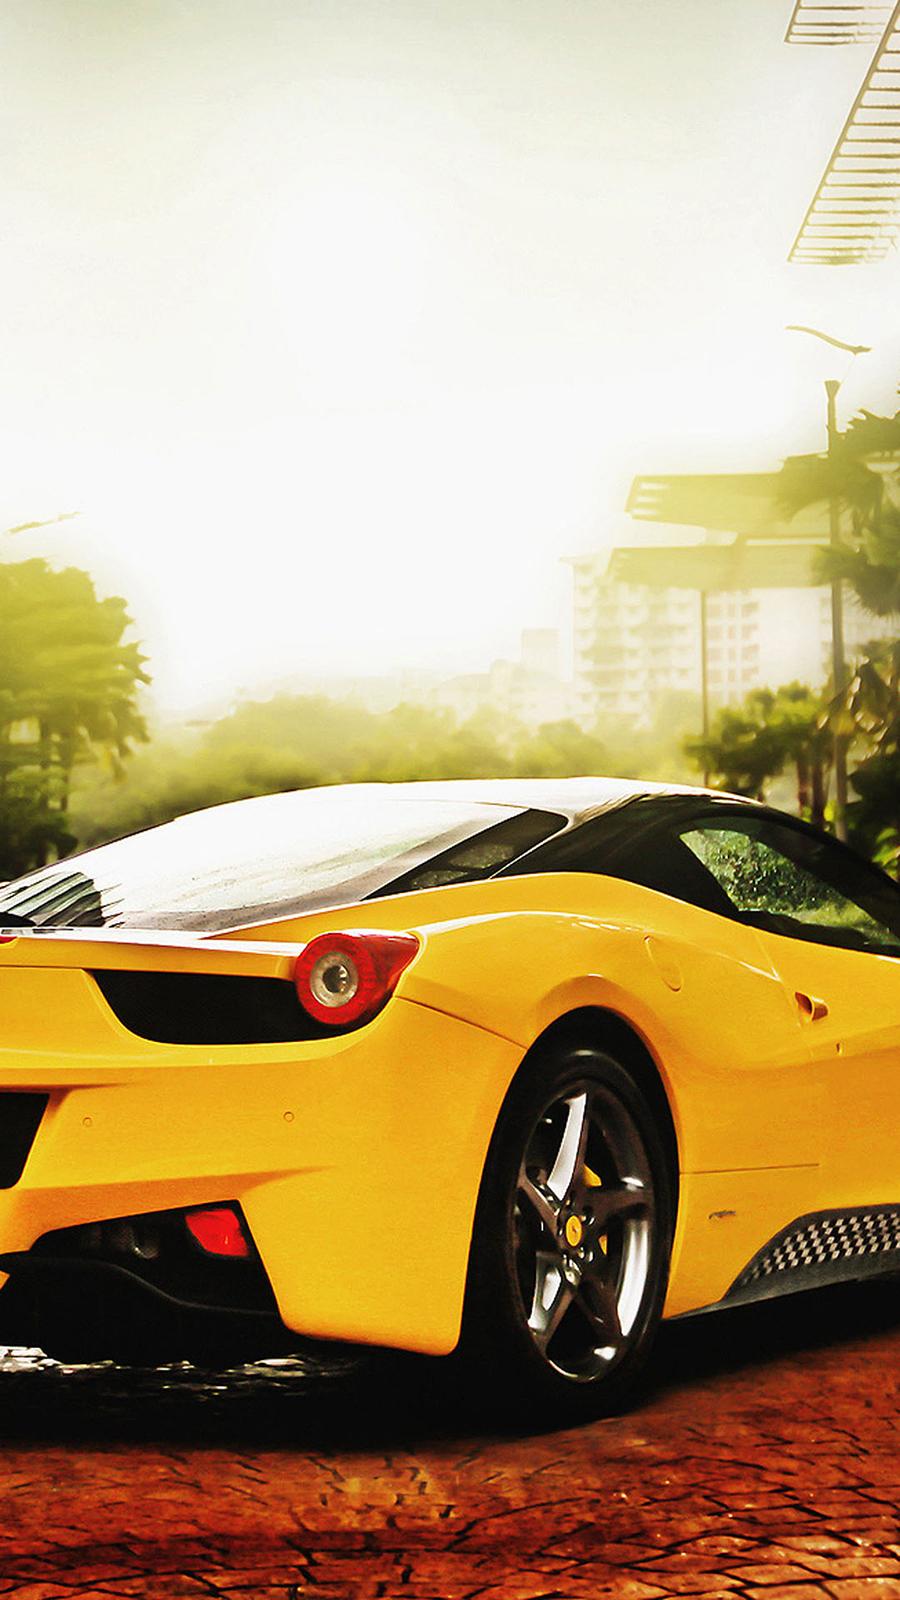 Ferrari 458 Spider Yellow Phone Wallpapers Free Download